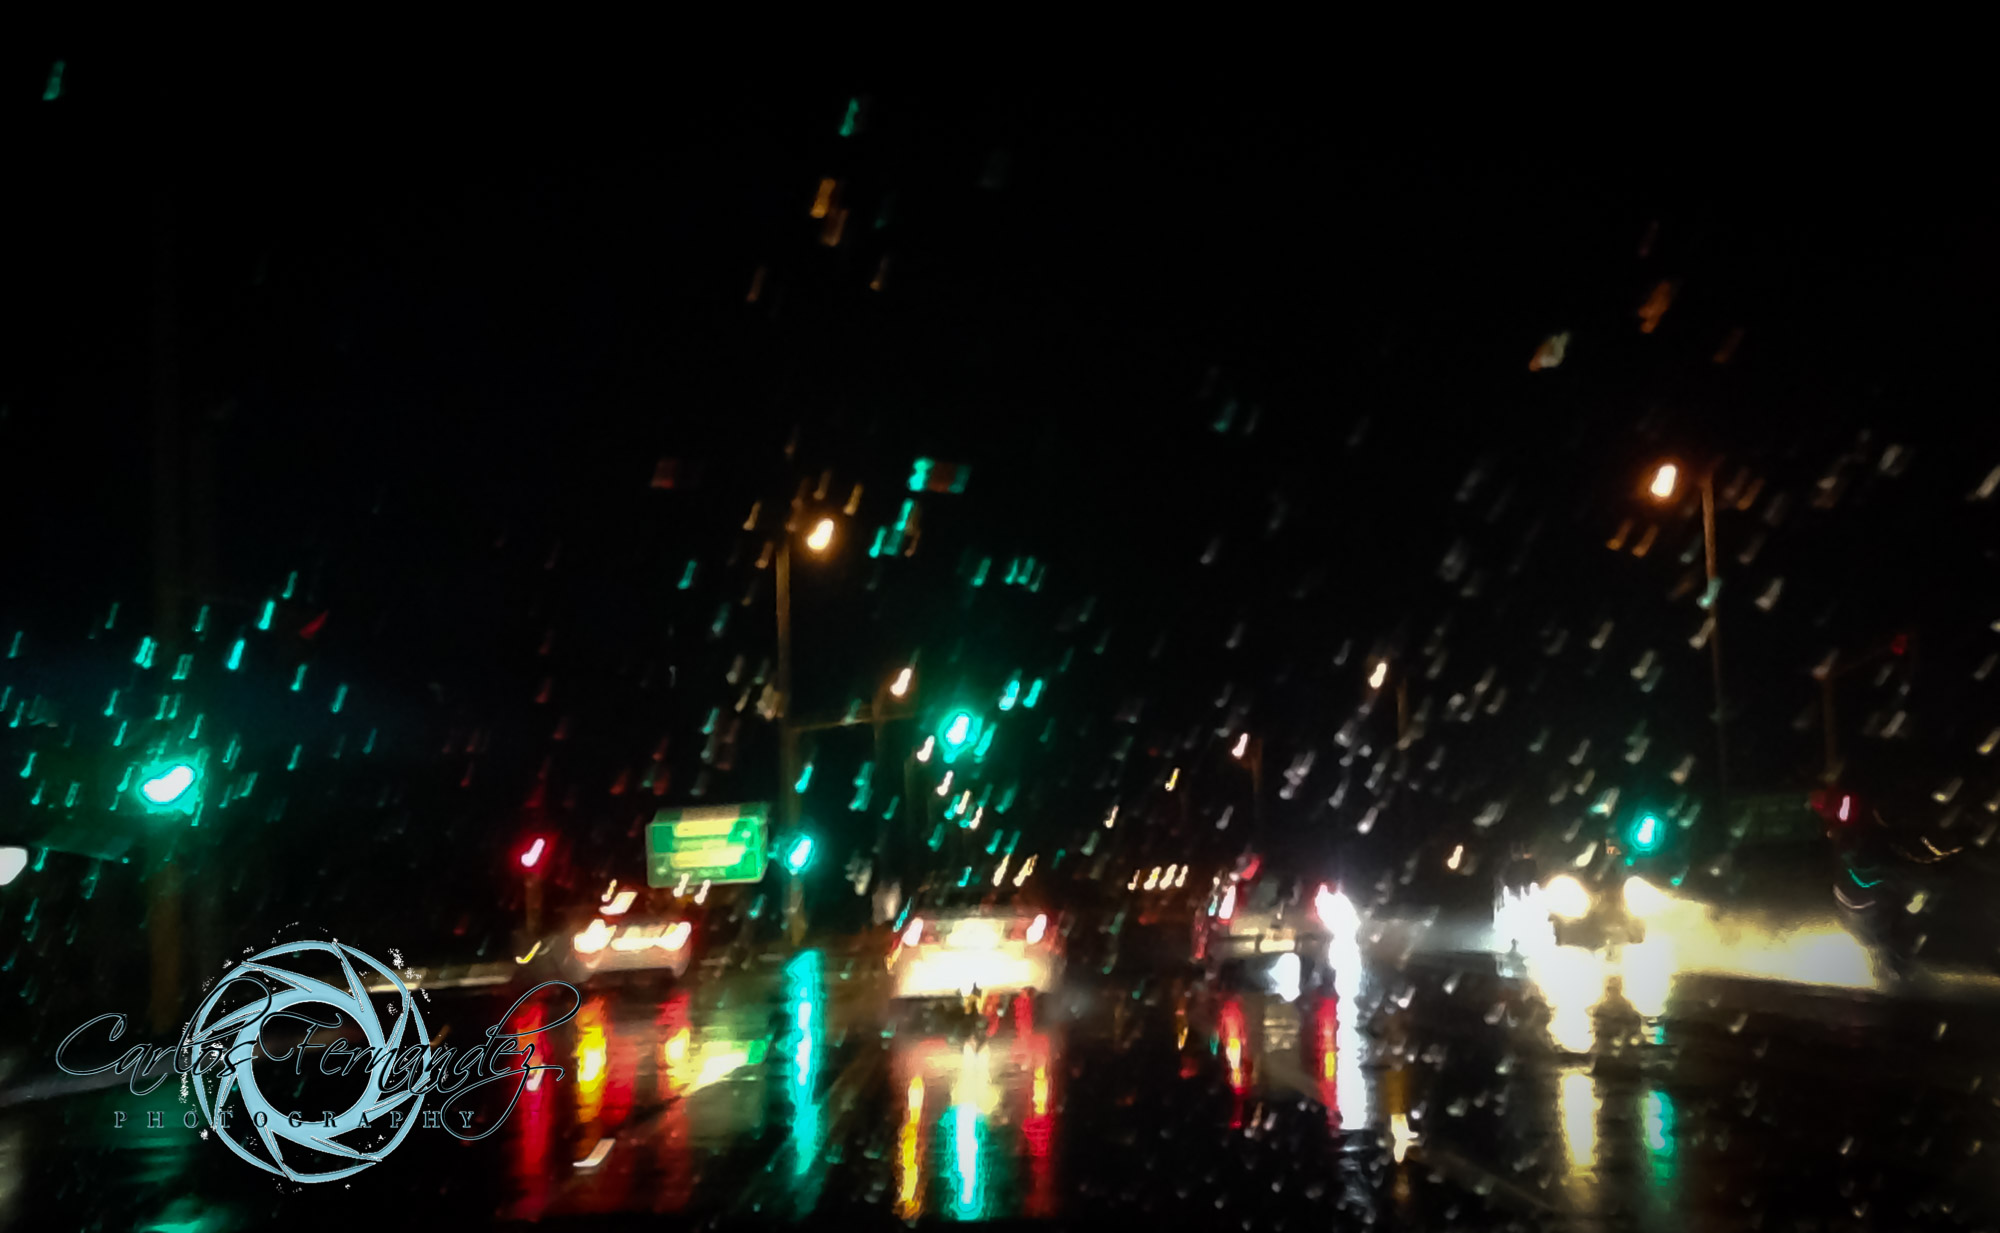 Rainy Night in Cape Town - 232/365